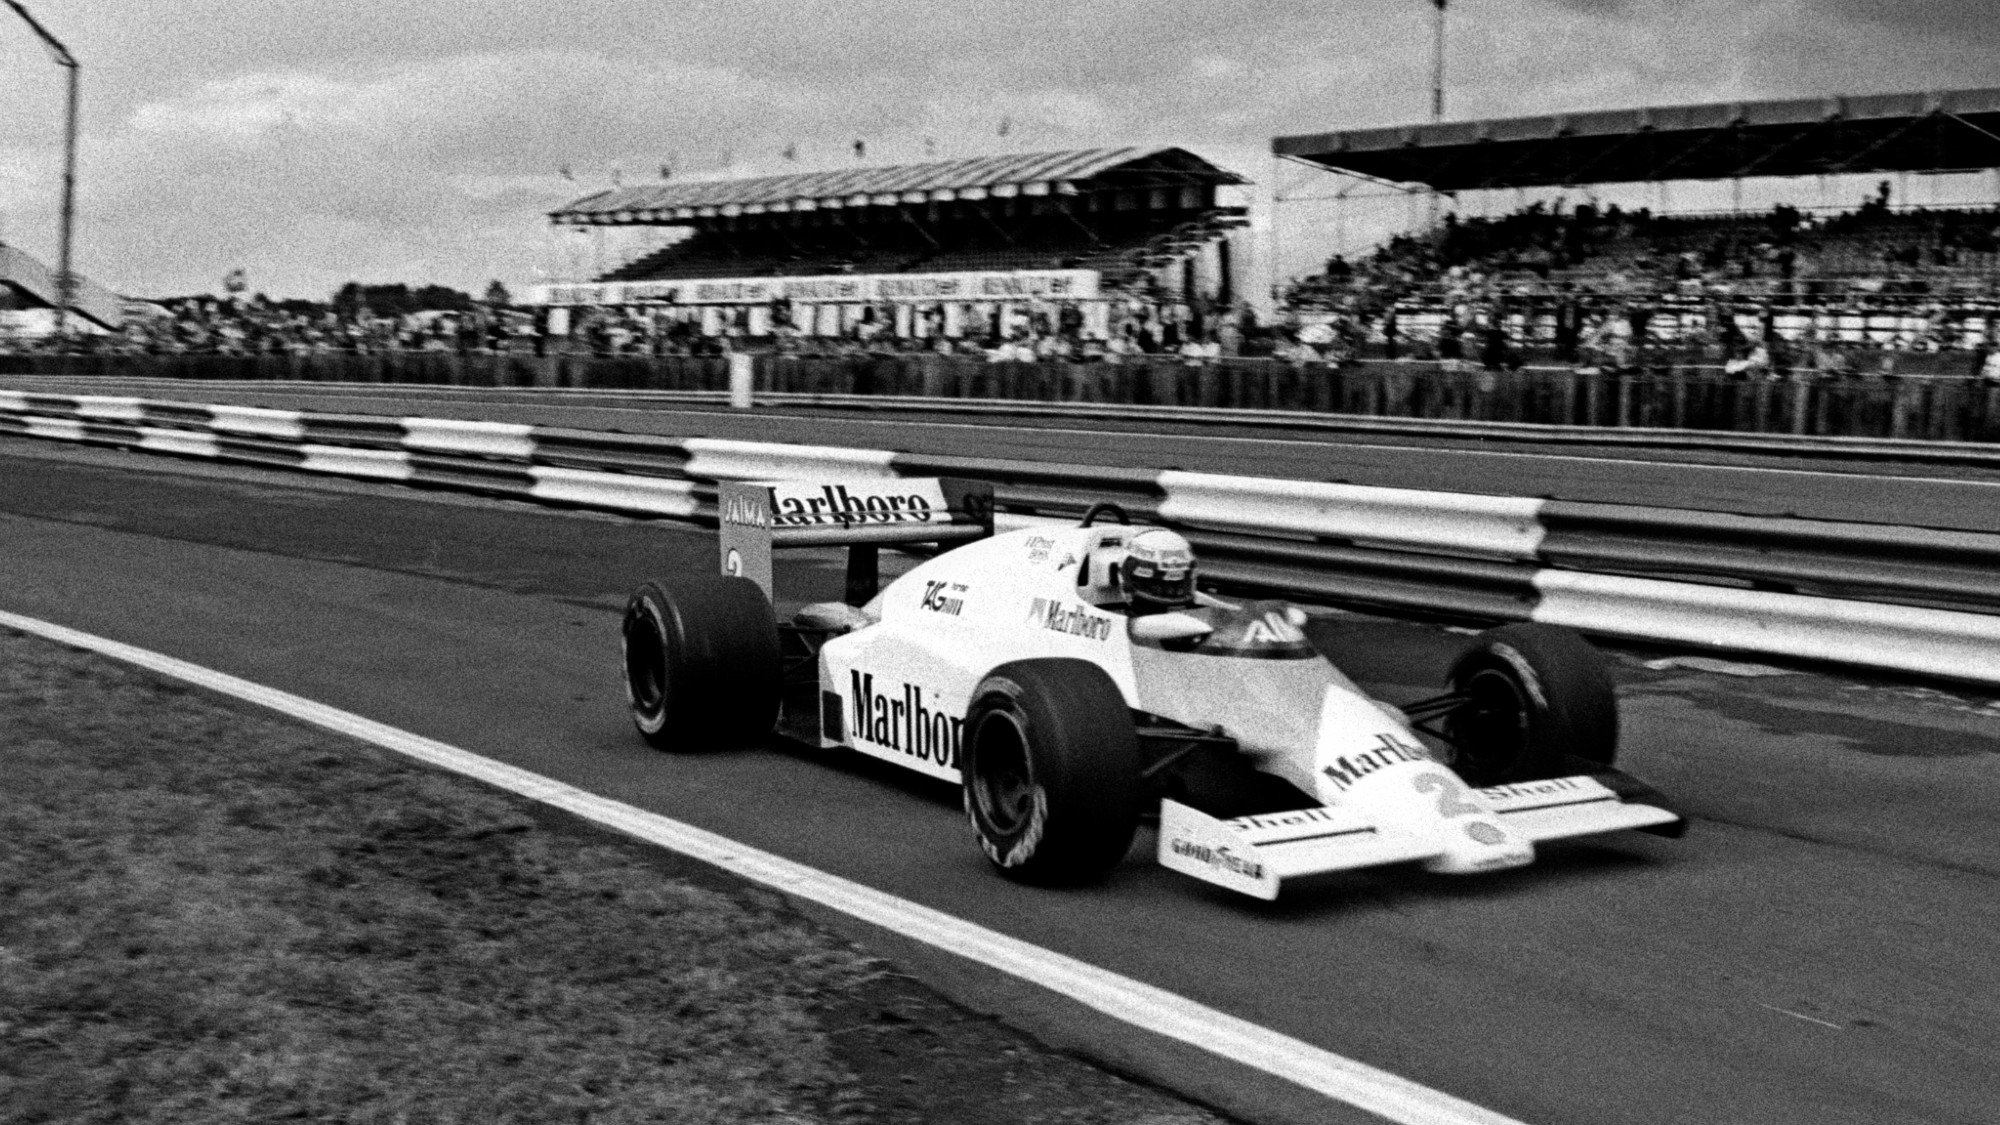 Alain Prost, 1985 British GP